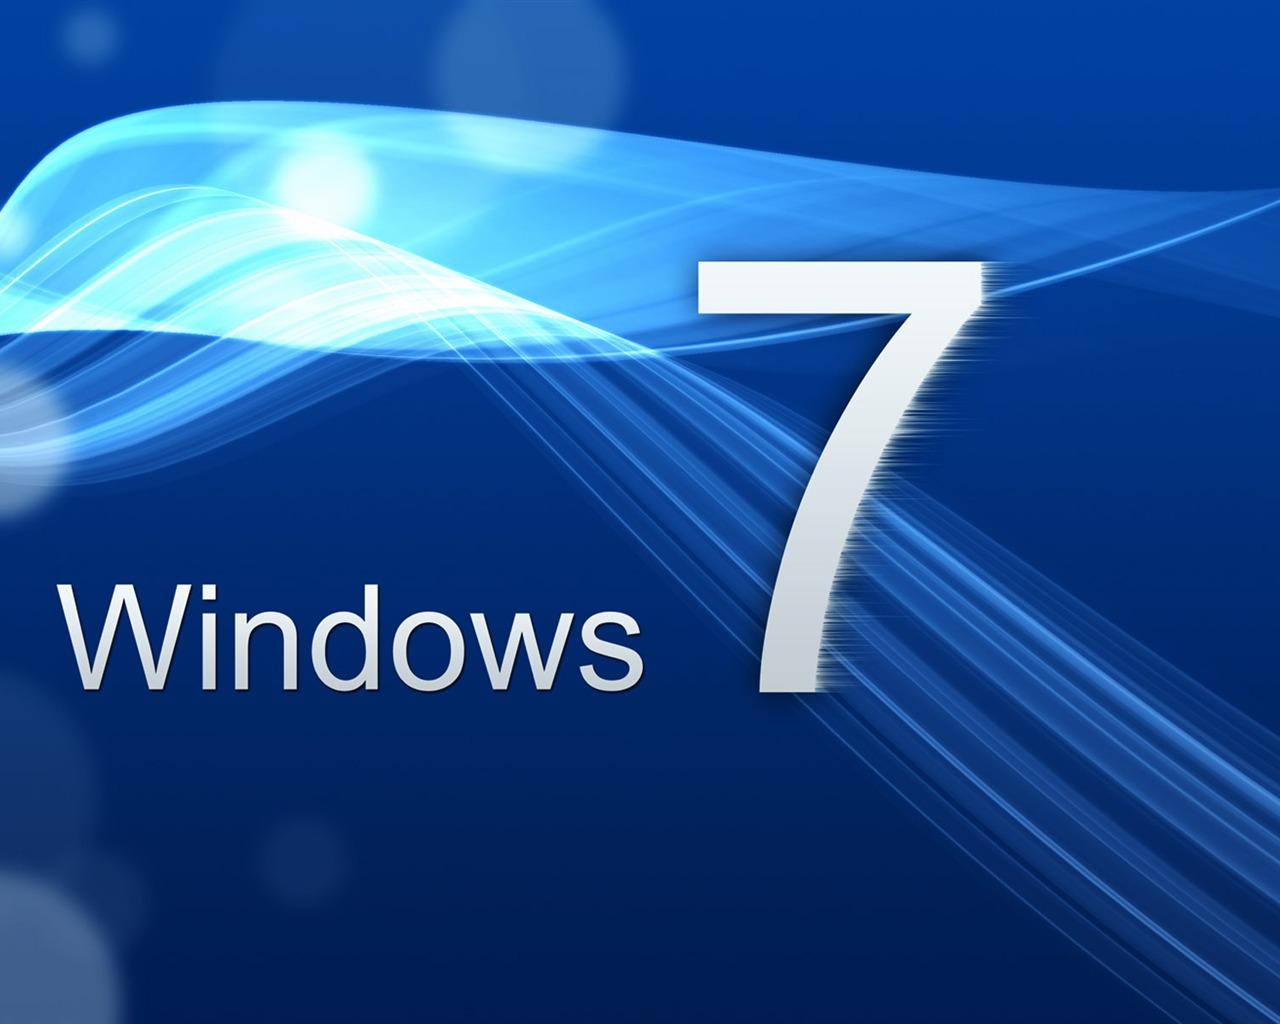 Windows 7 live wallpaper wallpapersafari - Windows 7 love wallpapers ...